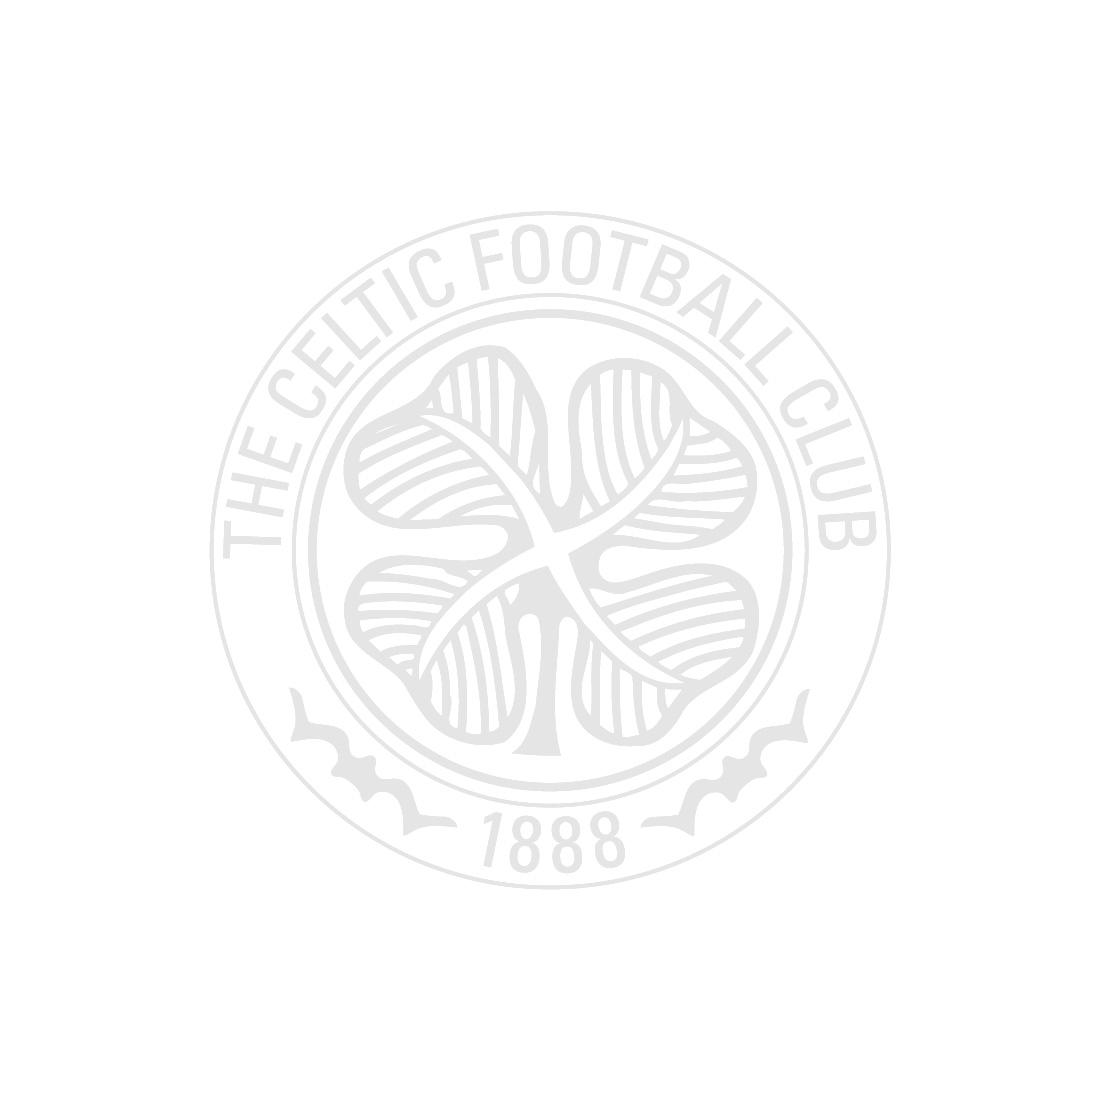 Celtic Mens Away Shirt 18/19 with Sponsor